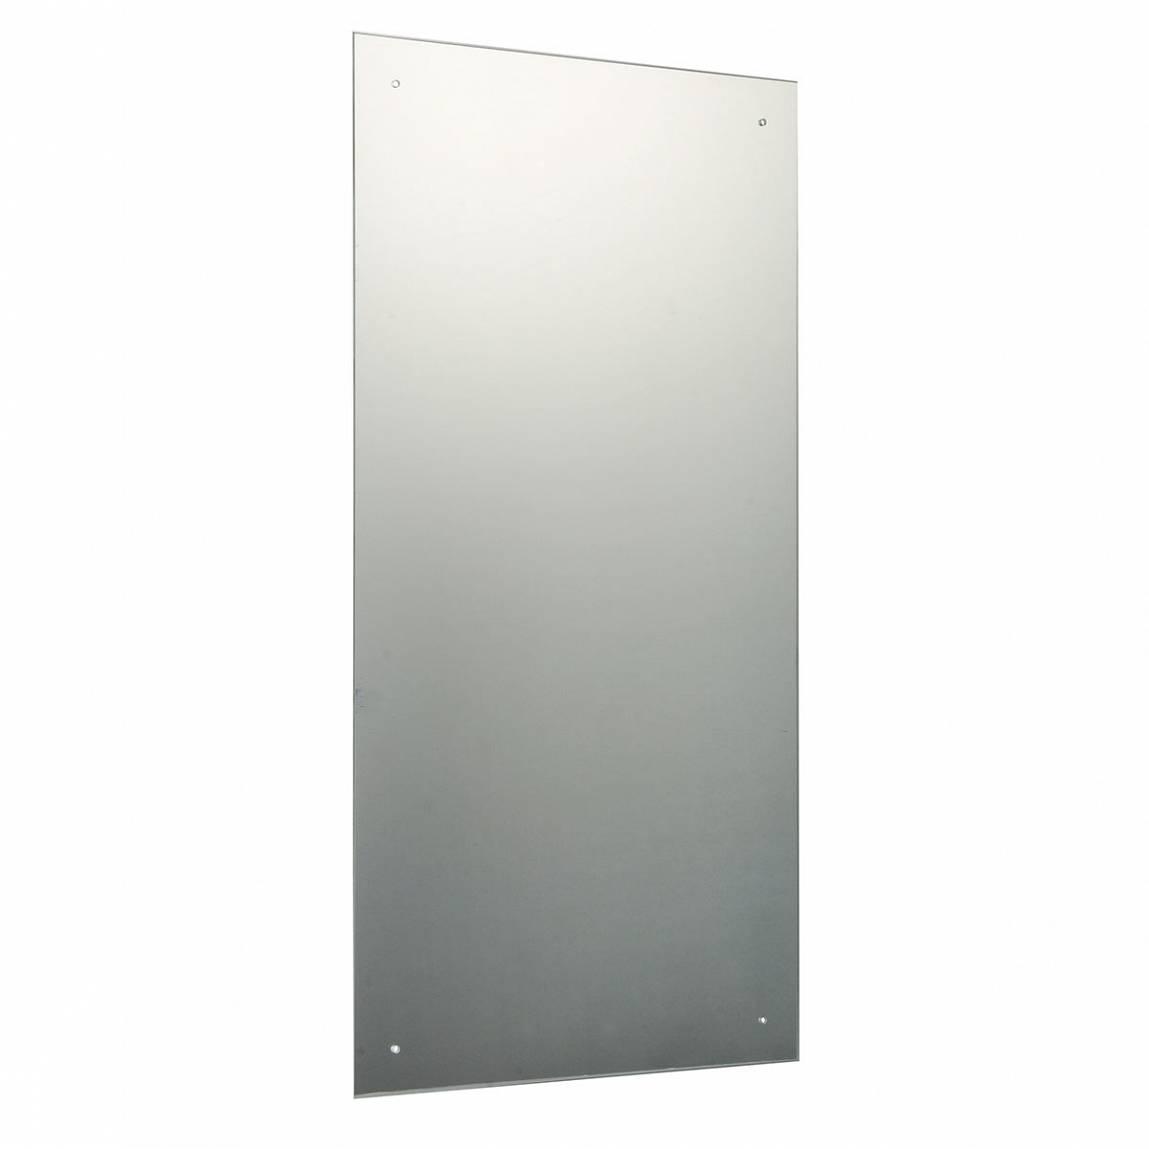 Image of Rectangular Drilled Mirror 90x45cm